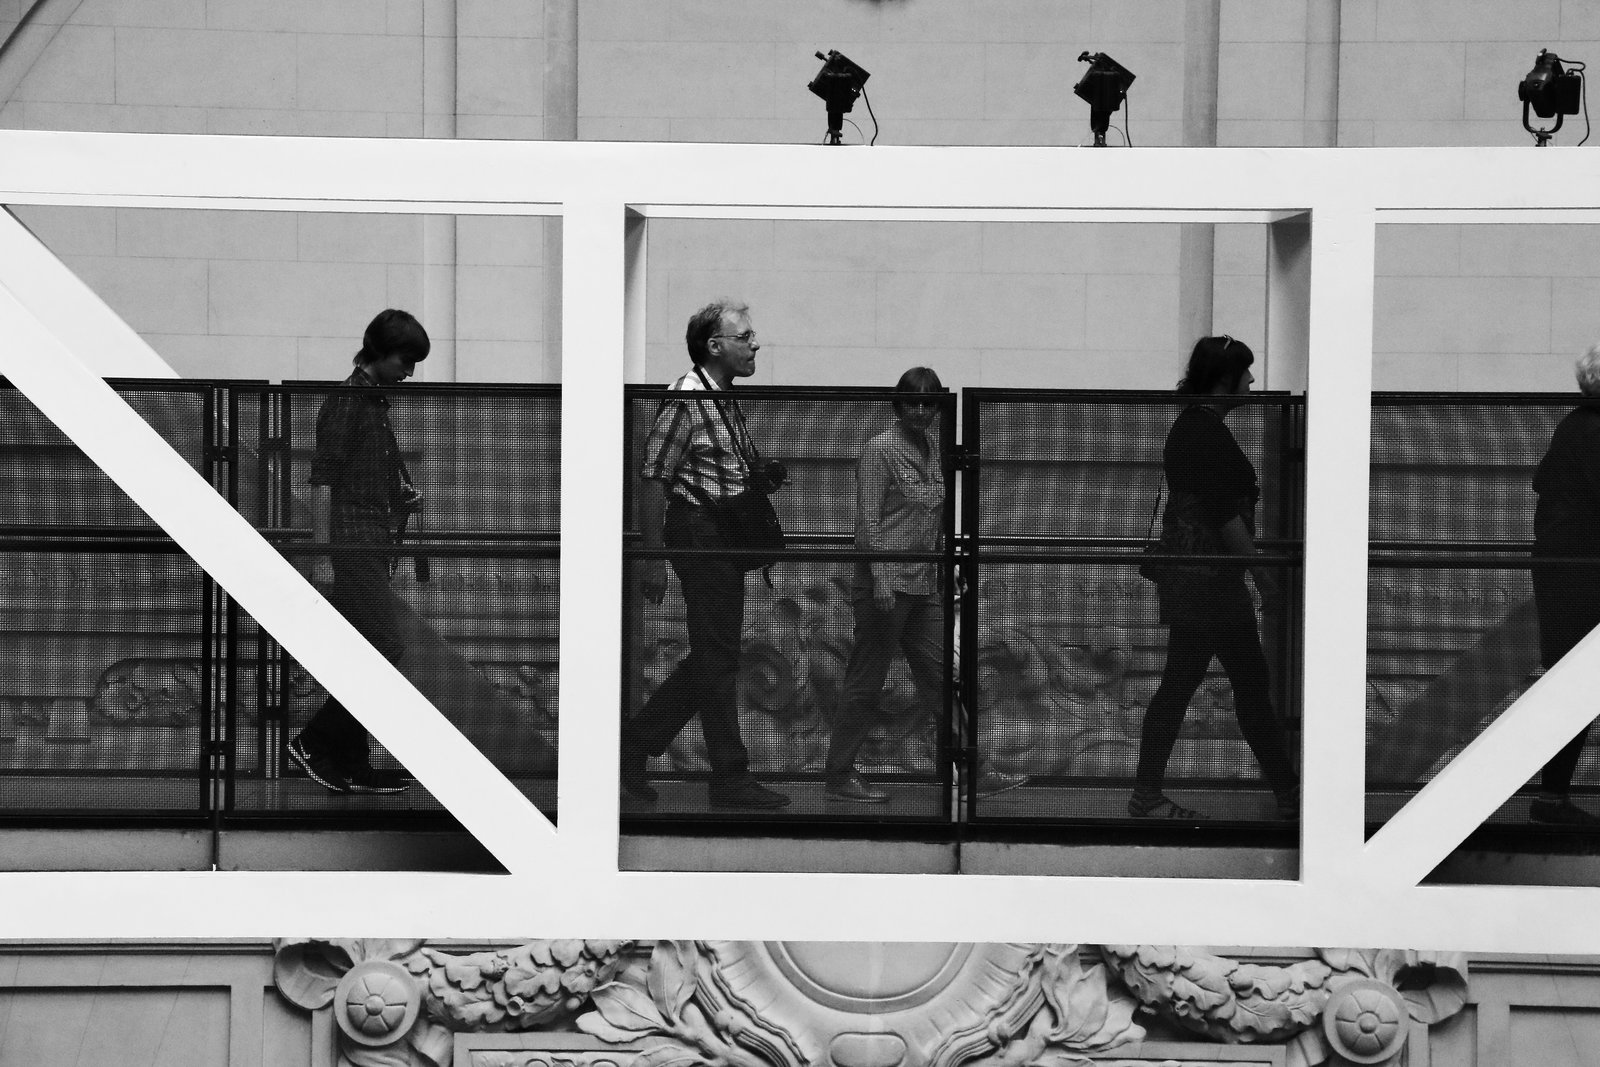 Passengers in Musee d'Orsay in Paris